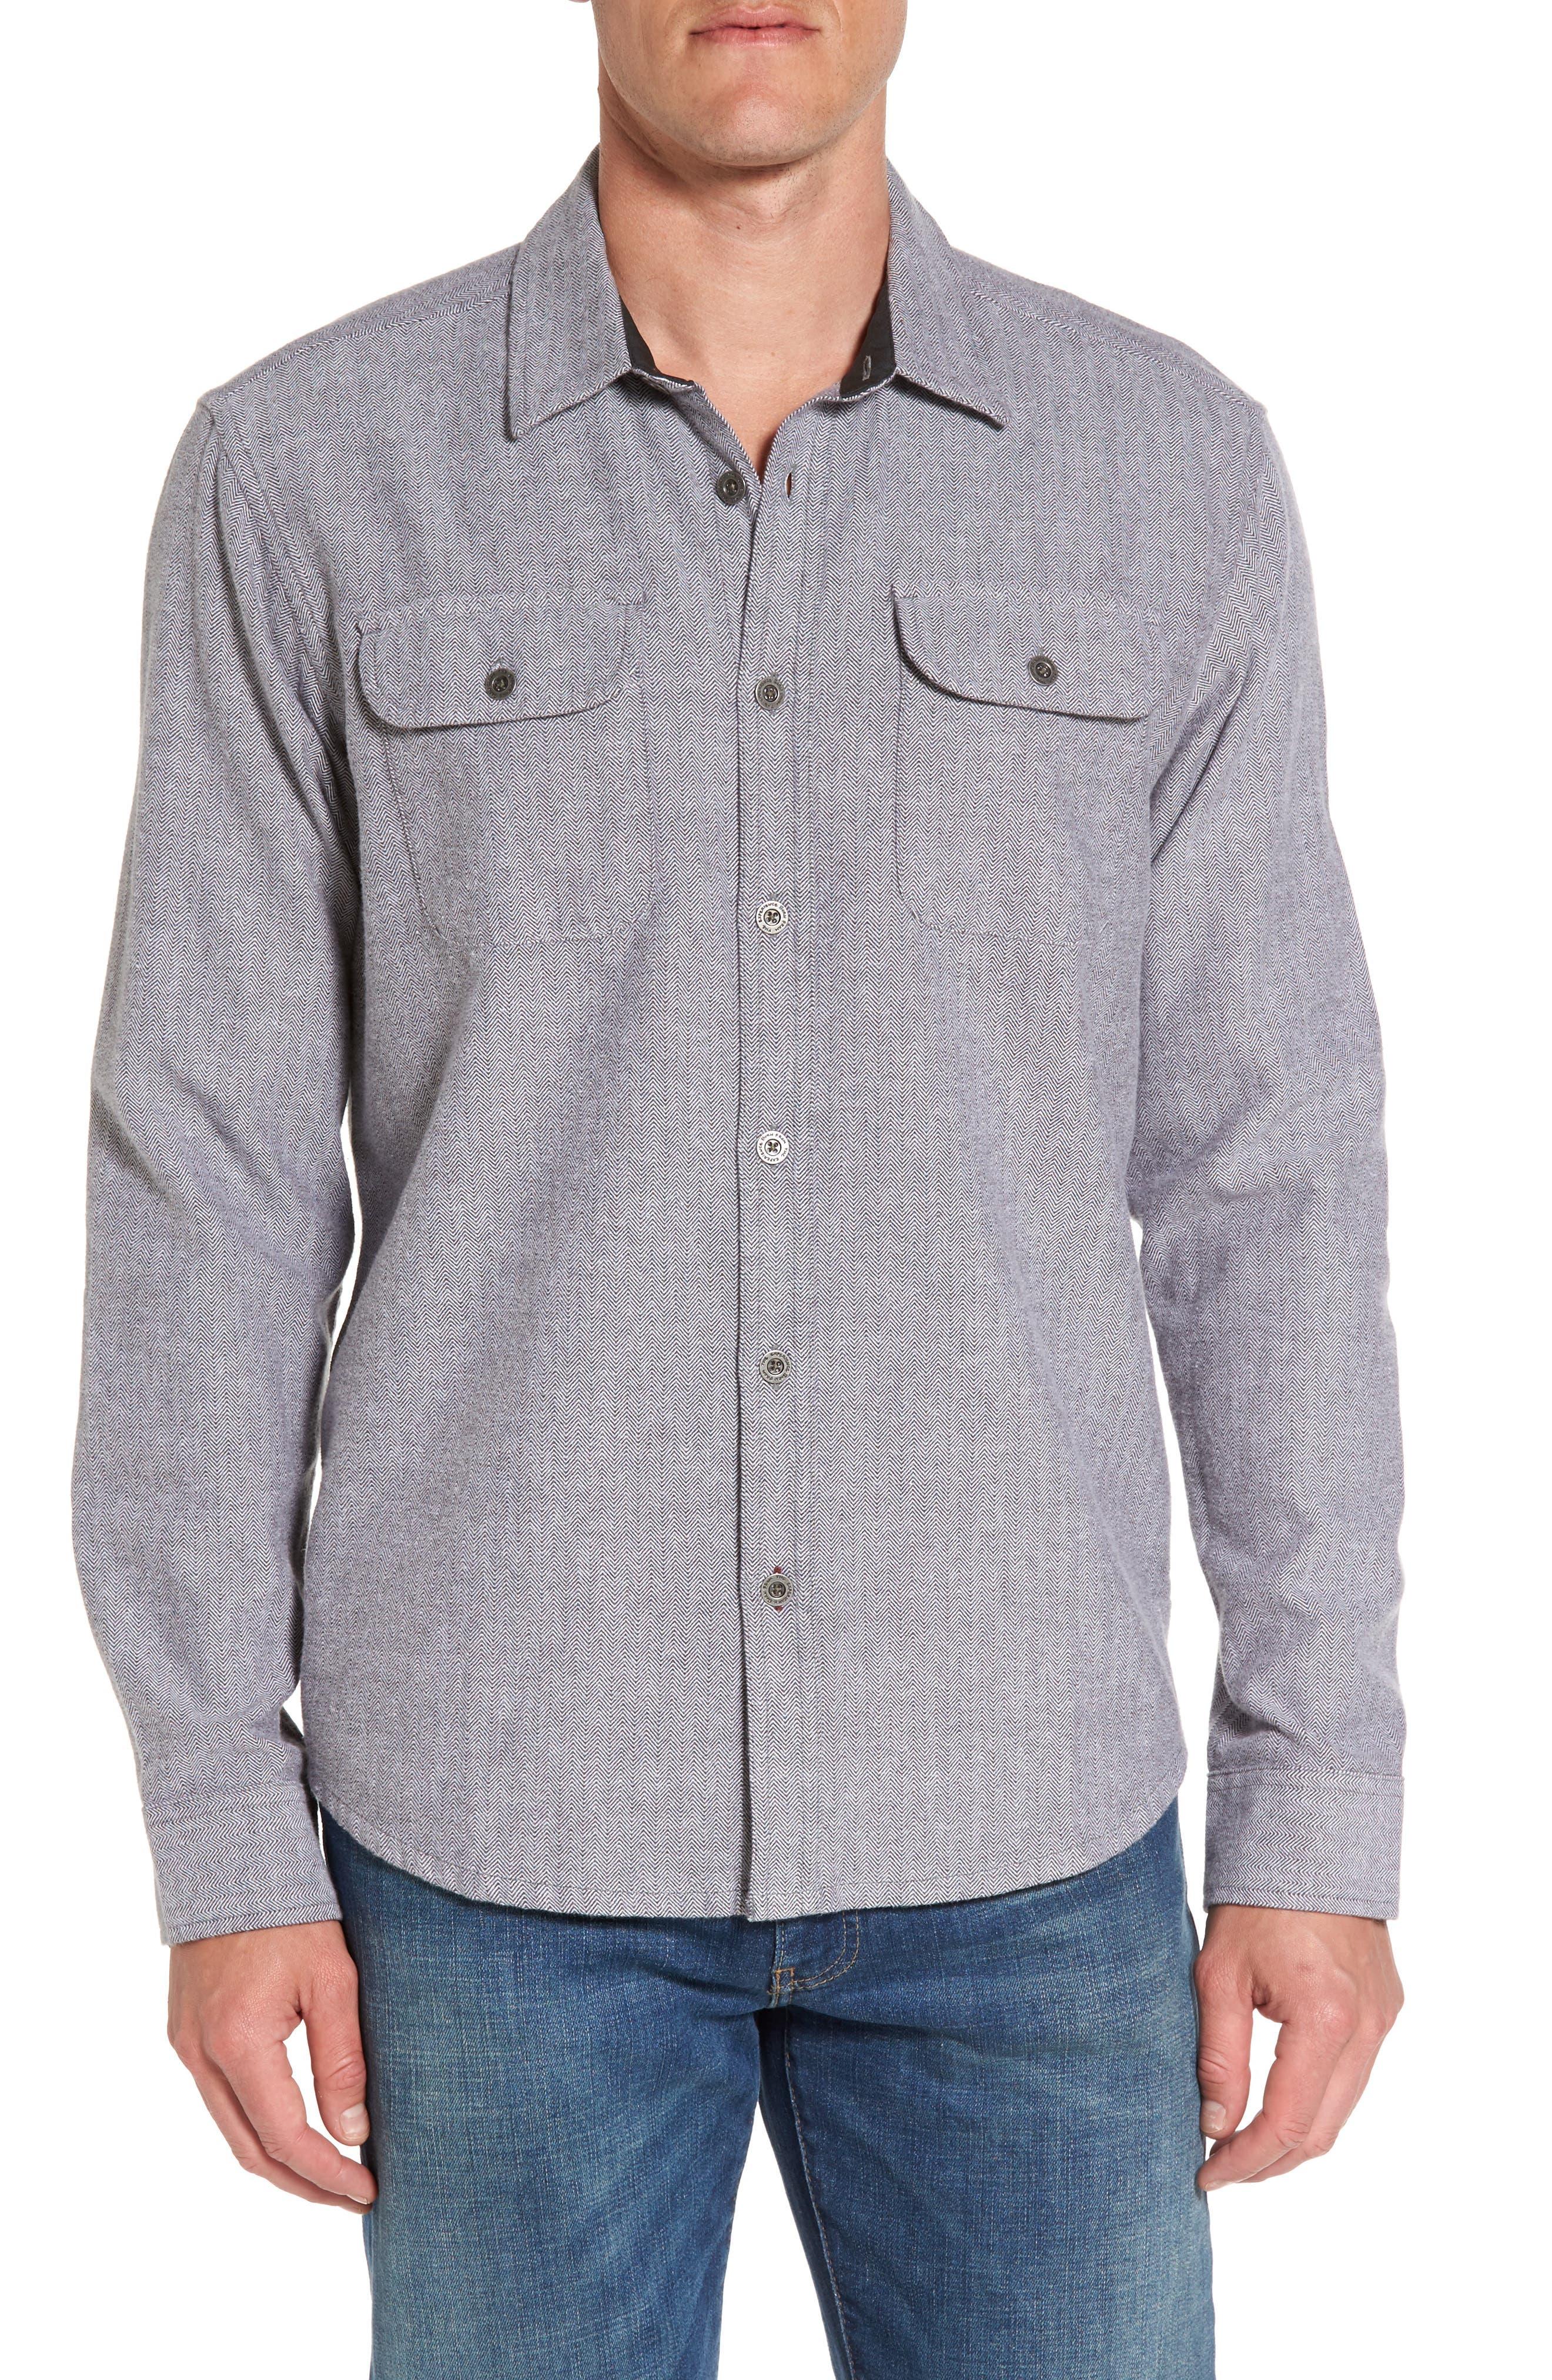 Lybek Regular Fit Herringbone Flannel Shirt,                             Main thumbnail 1, color,                             Gravel